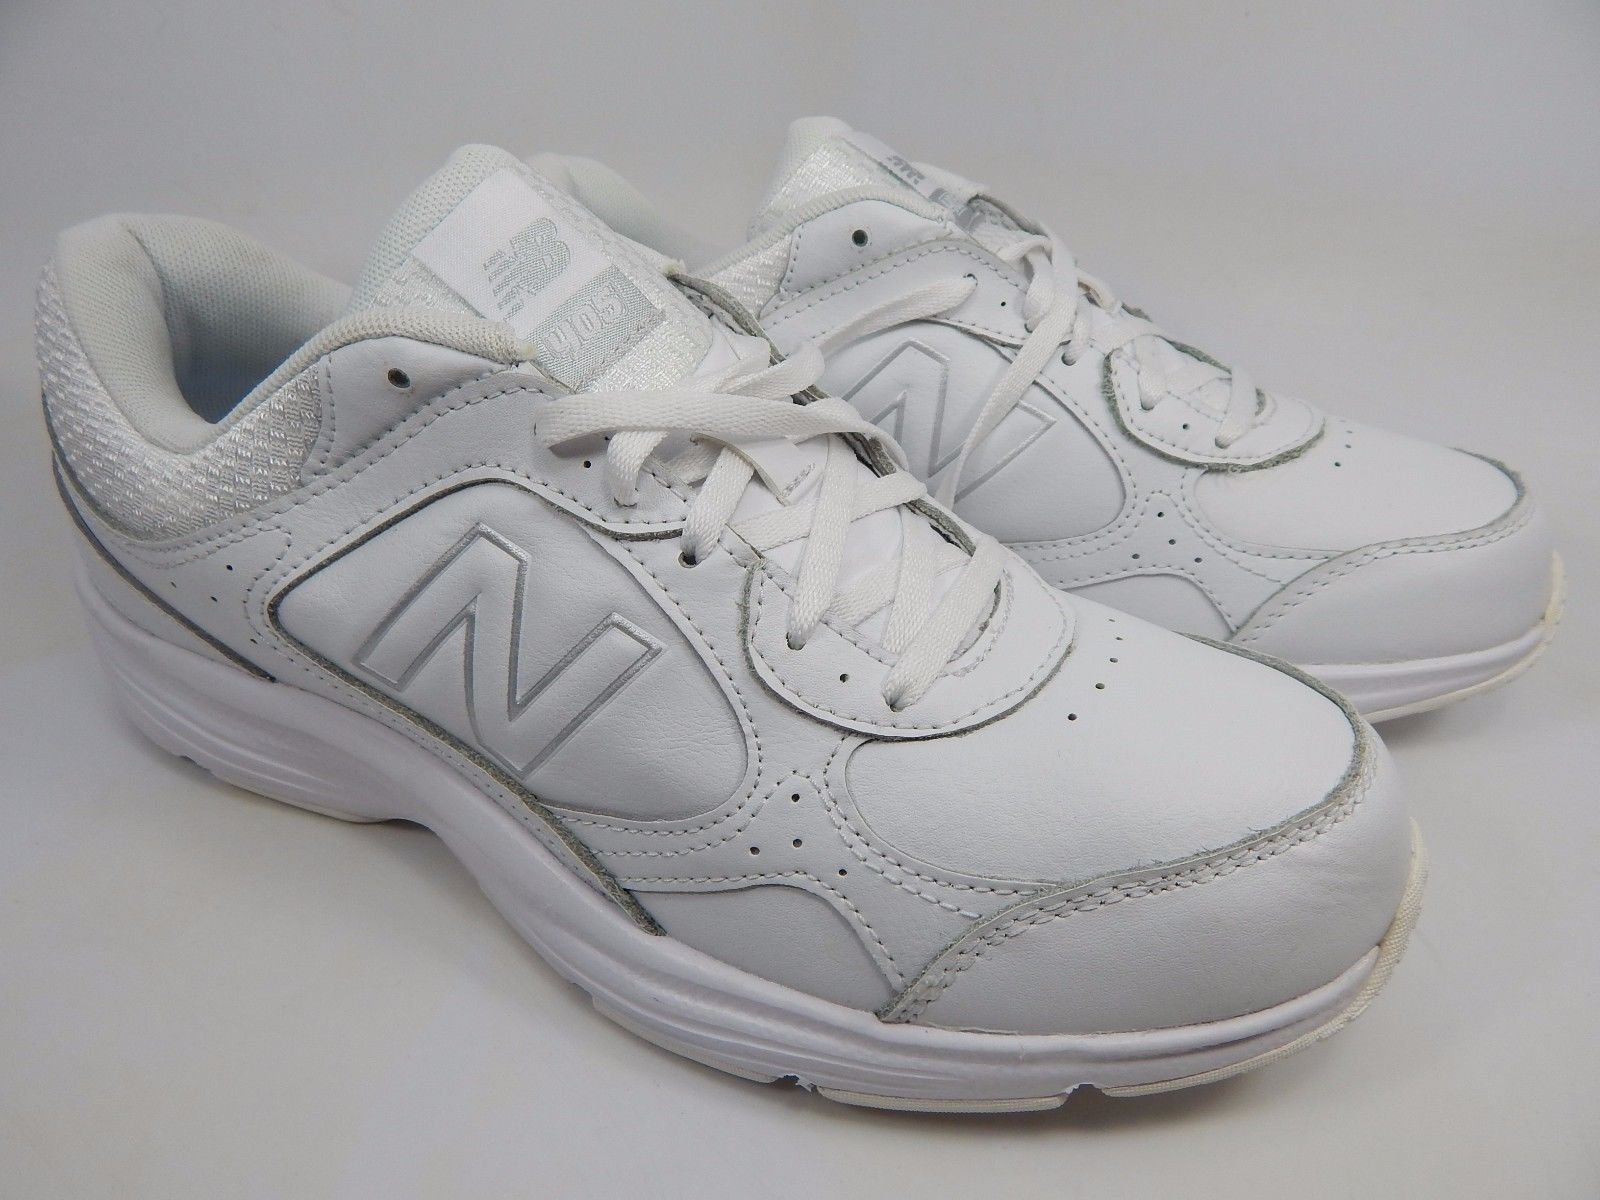 New Balance 405 Women's Walking Shoes Sz US 6.5 M (B) EU 37 White WW405SW2